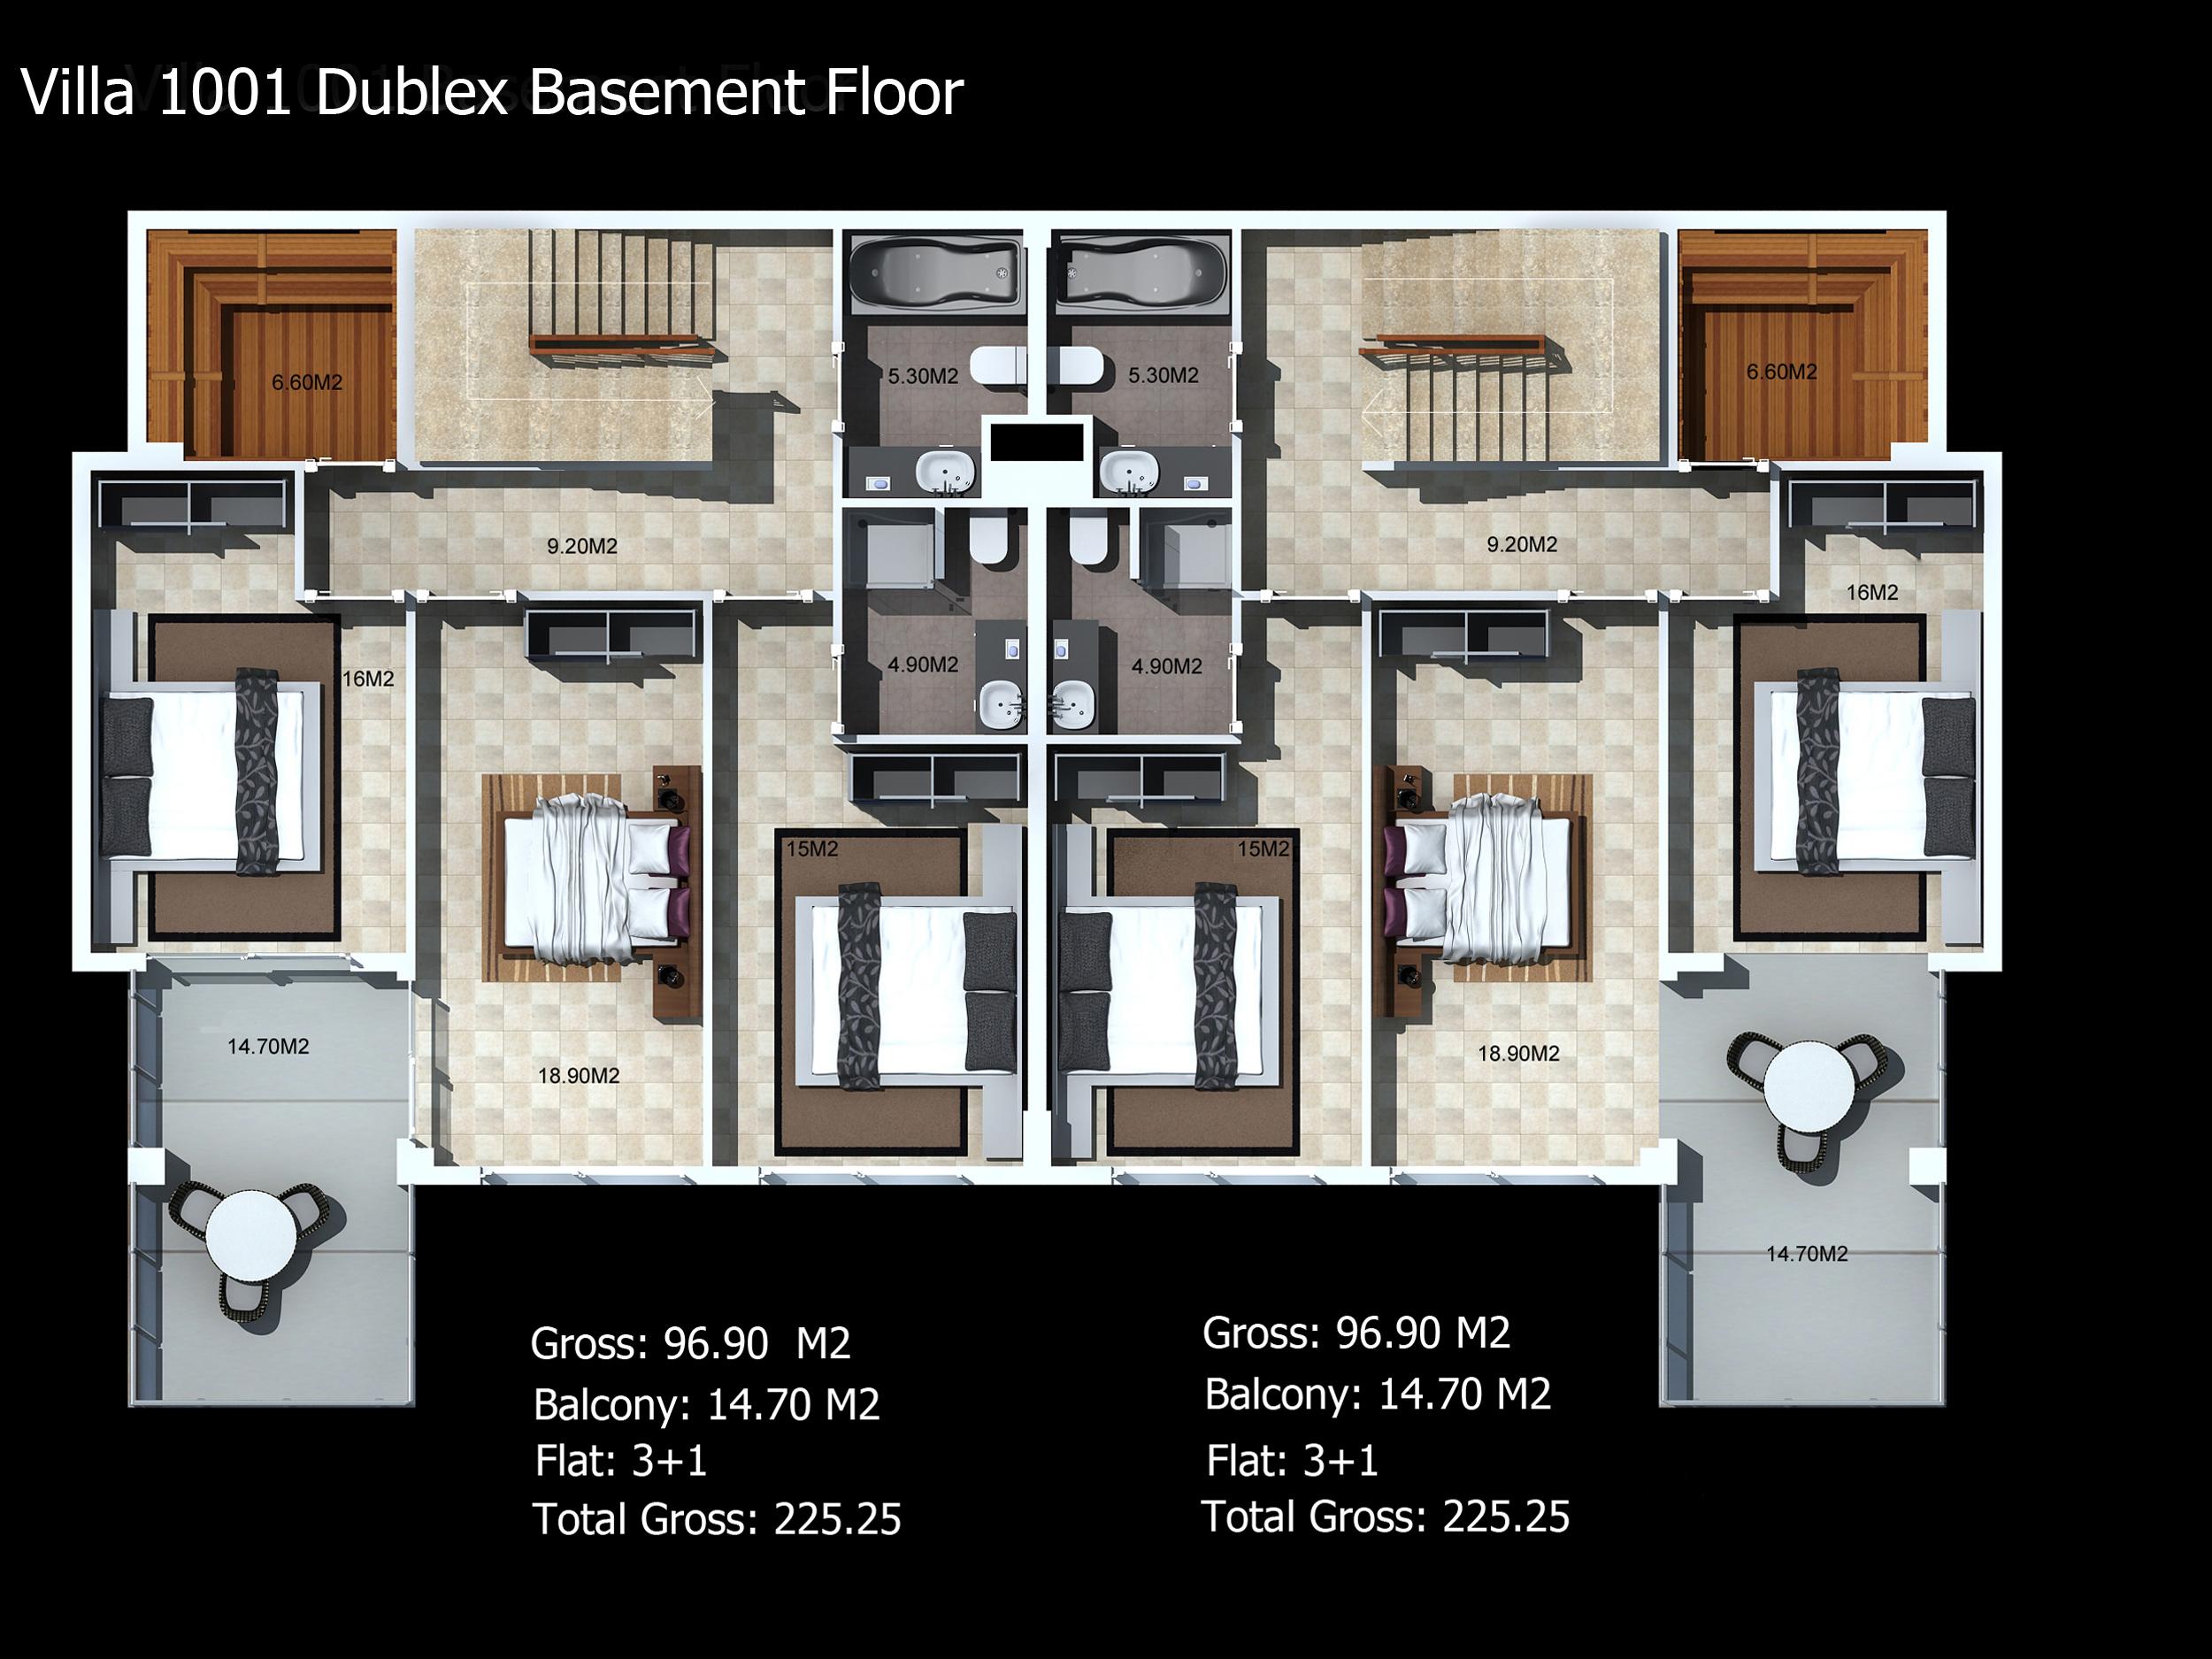 villa-1001-dublex-basement-floor